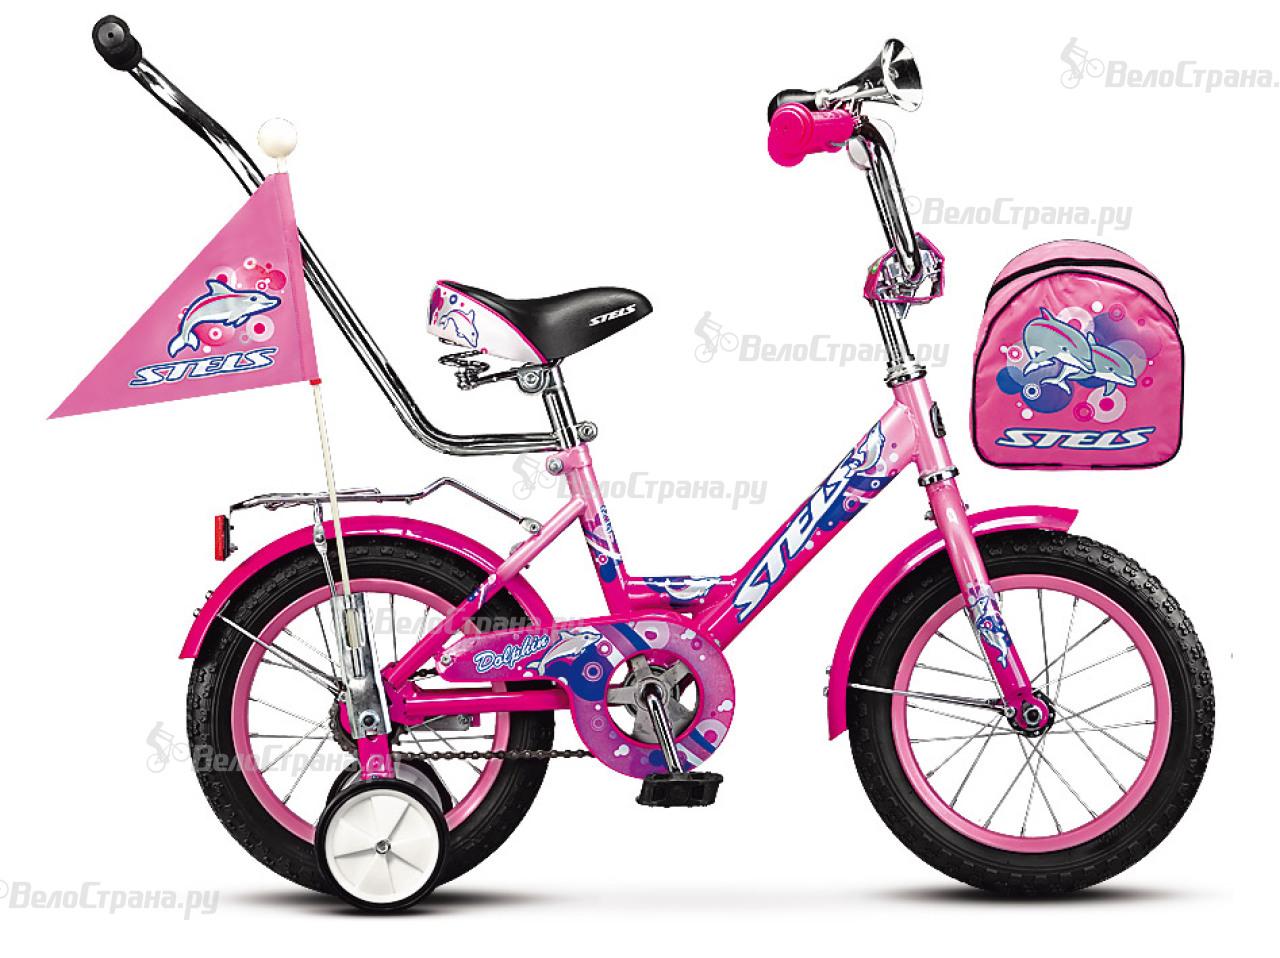 Велосипед Stels Dolphin 12 (2017) велосипед stels navigator 310 2016